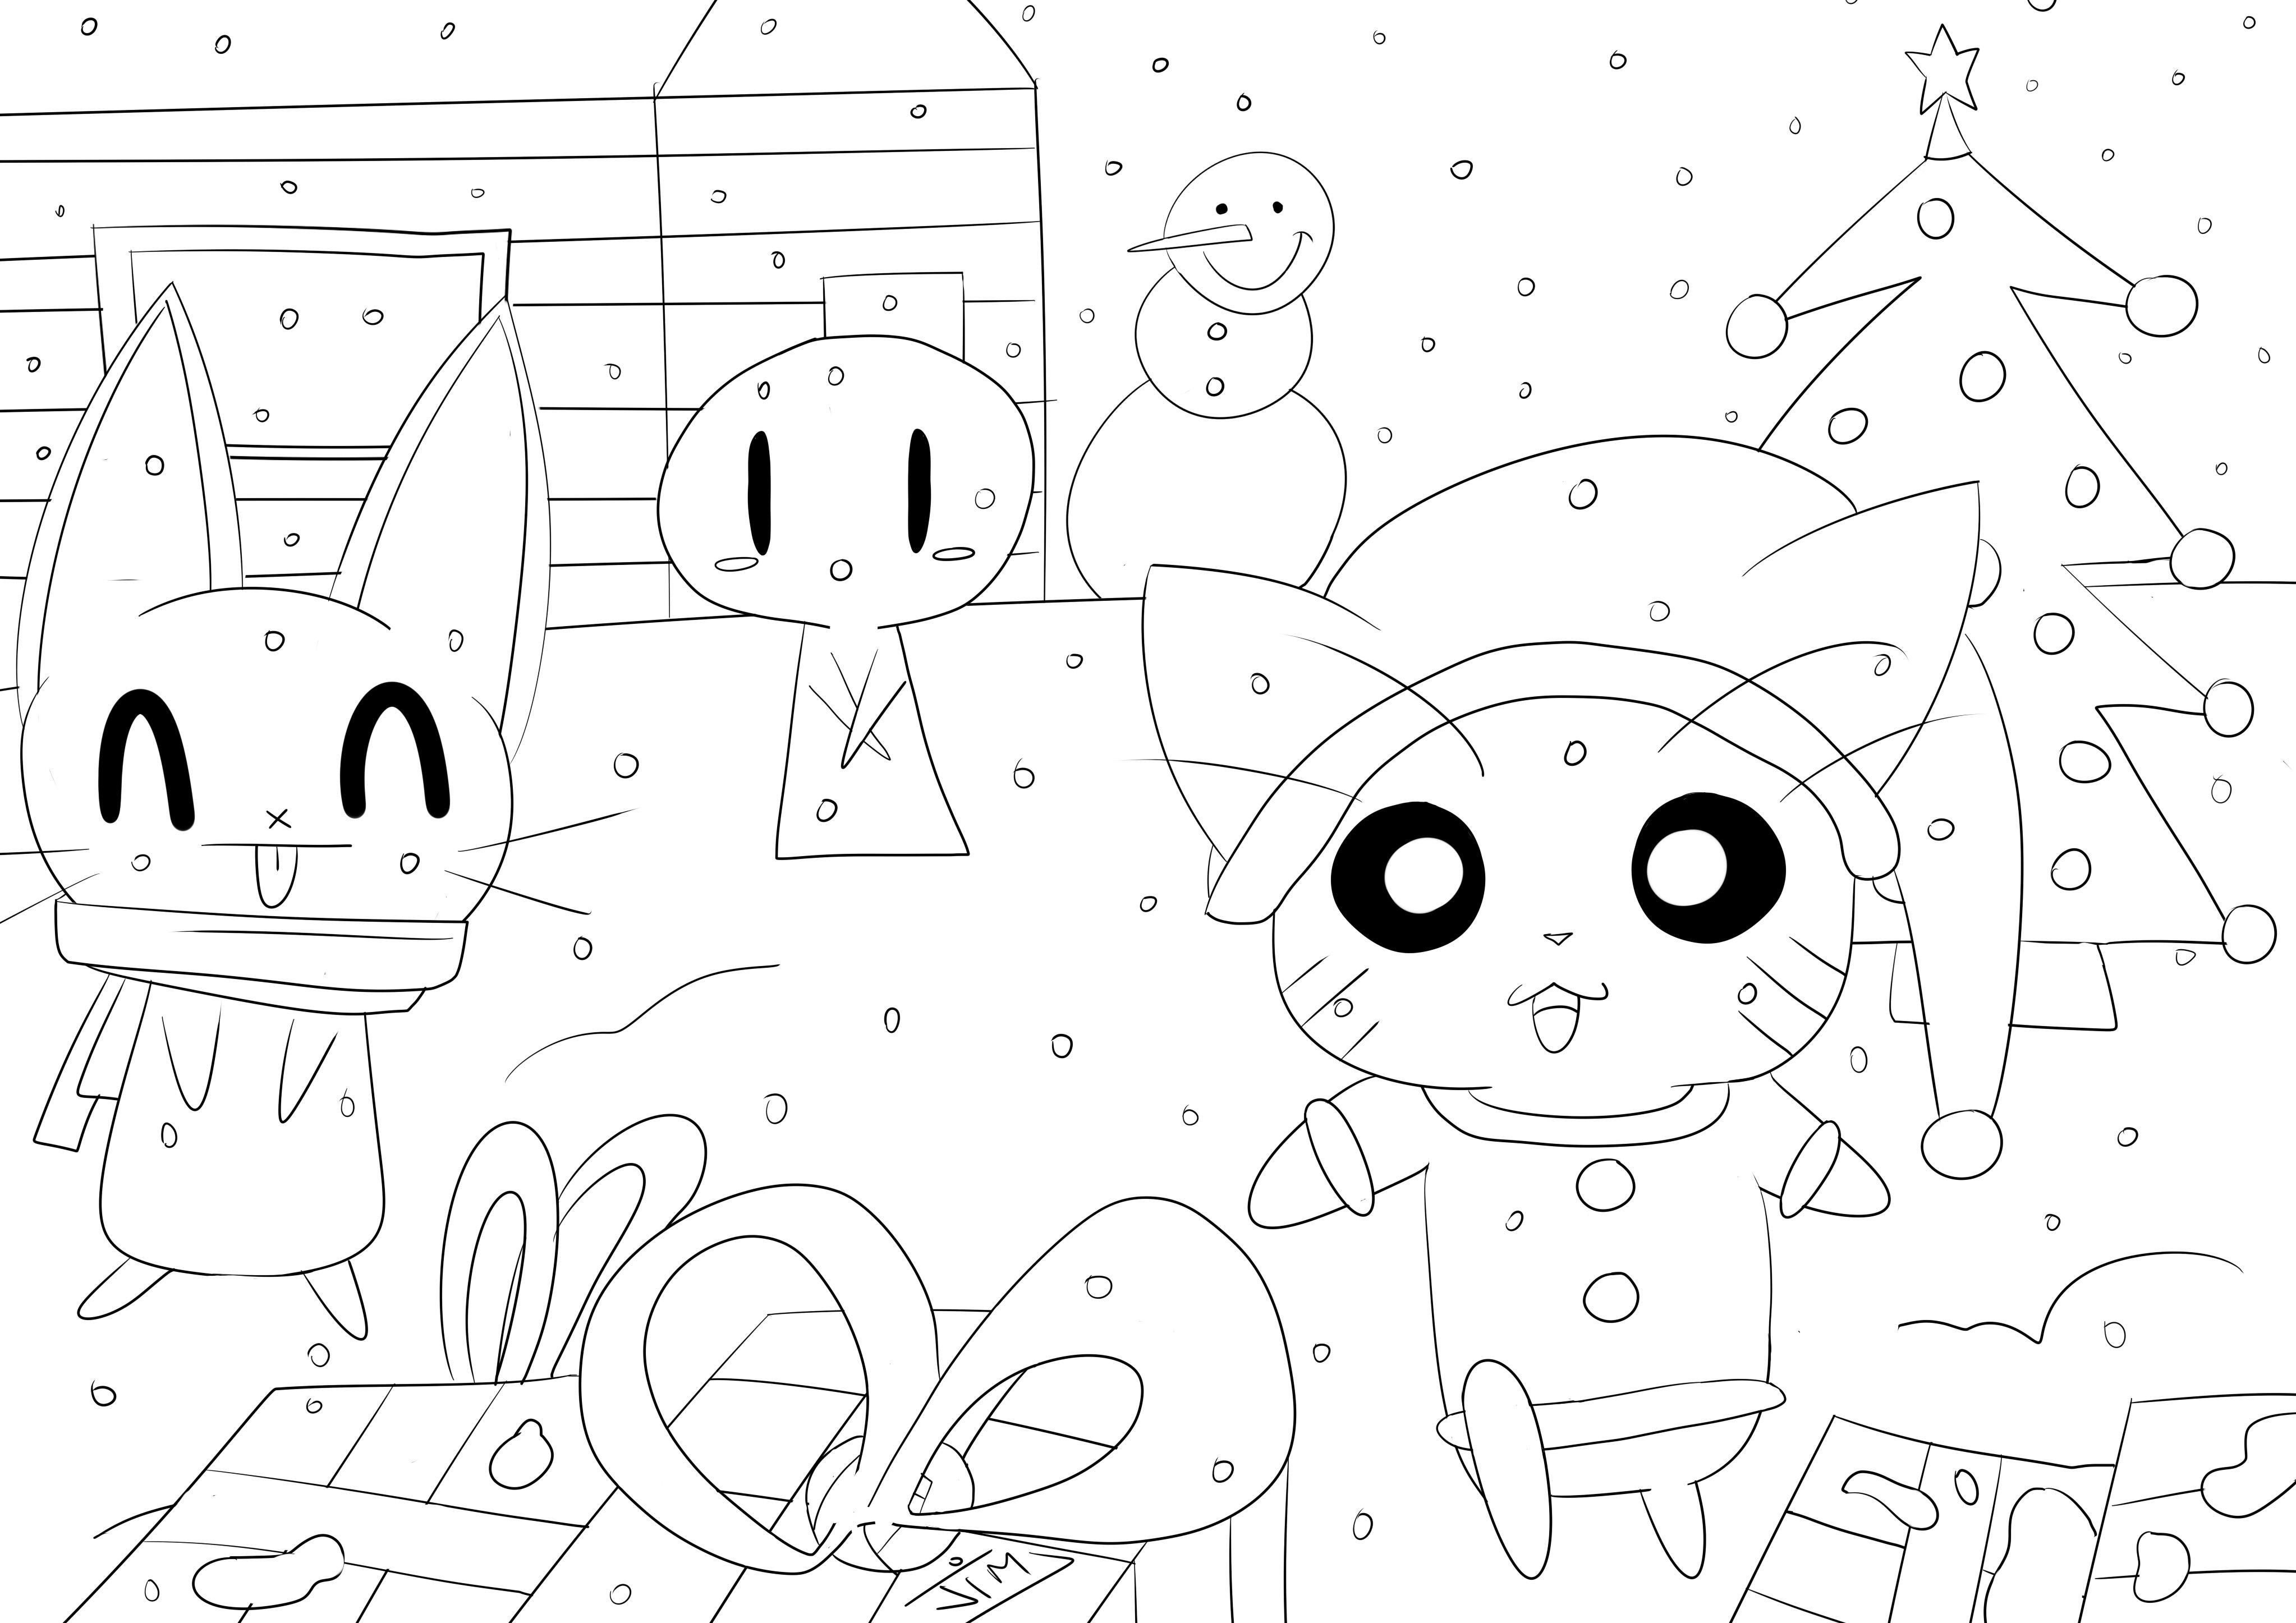 Disegni da colorare per adulti : Doodle art / Doodling - 41